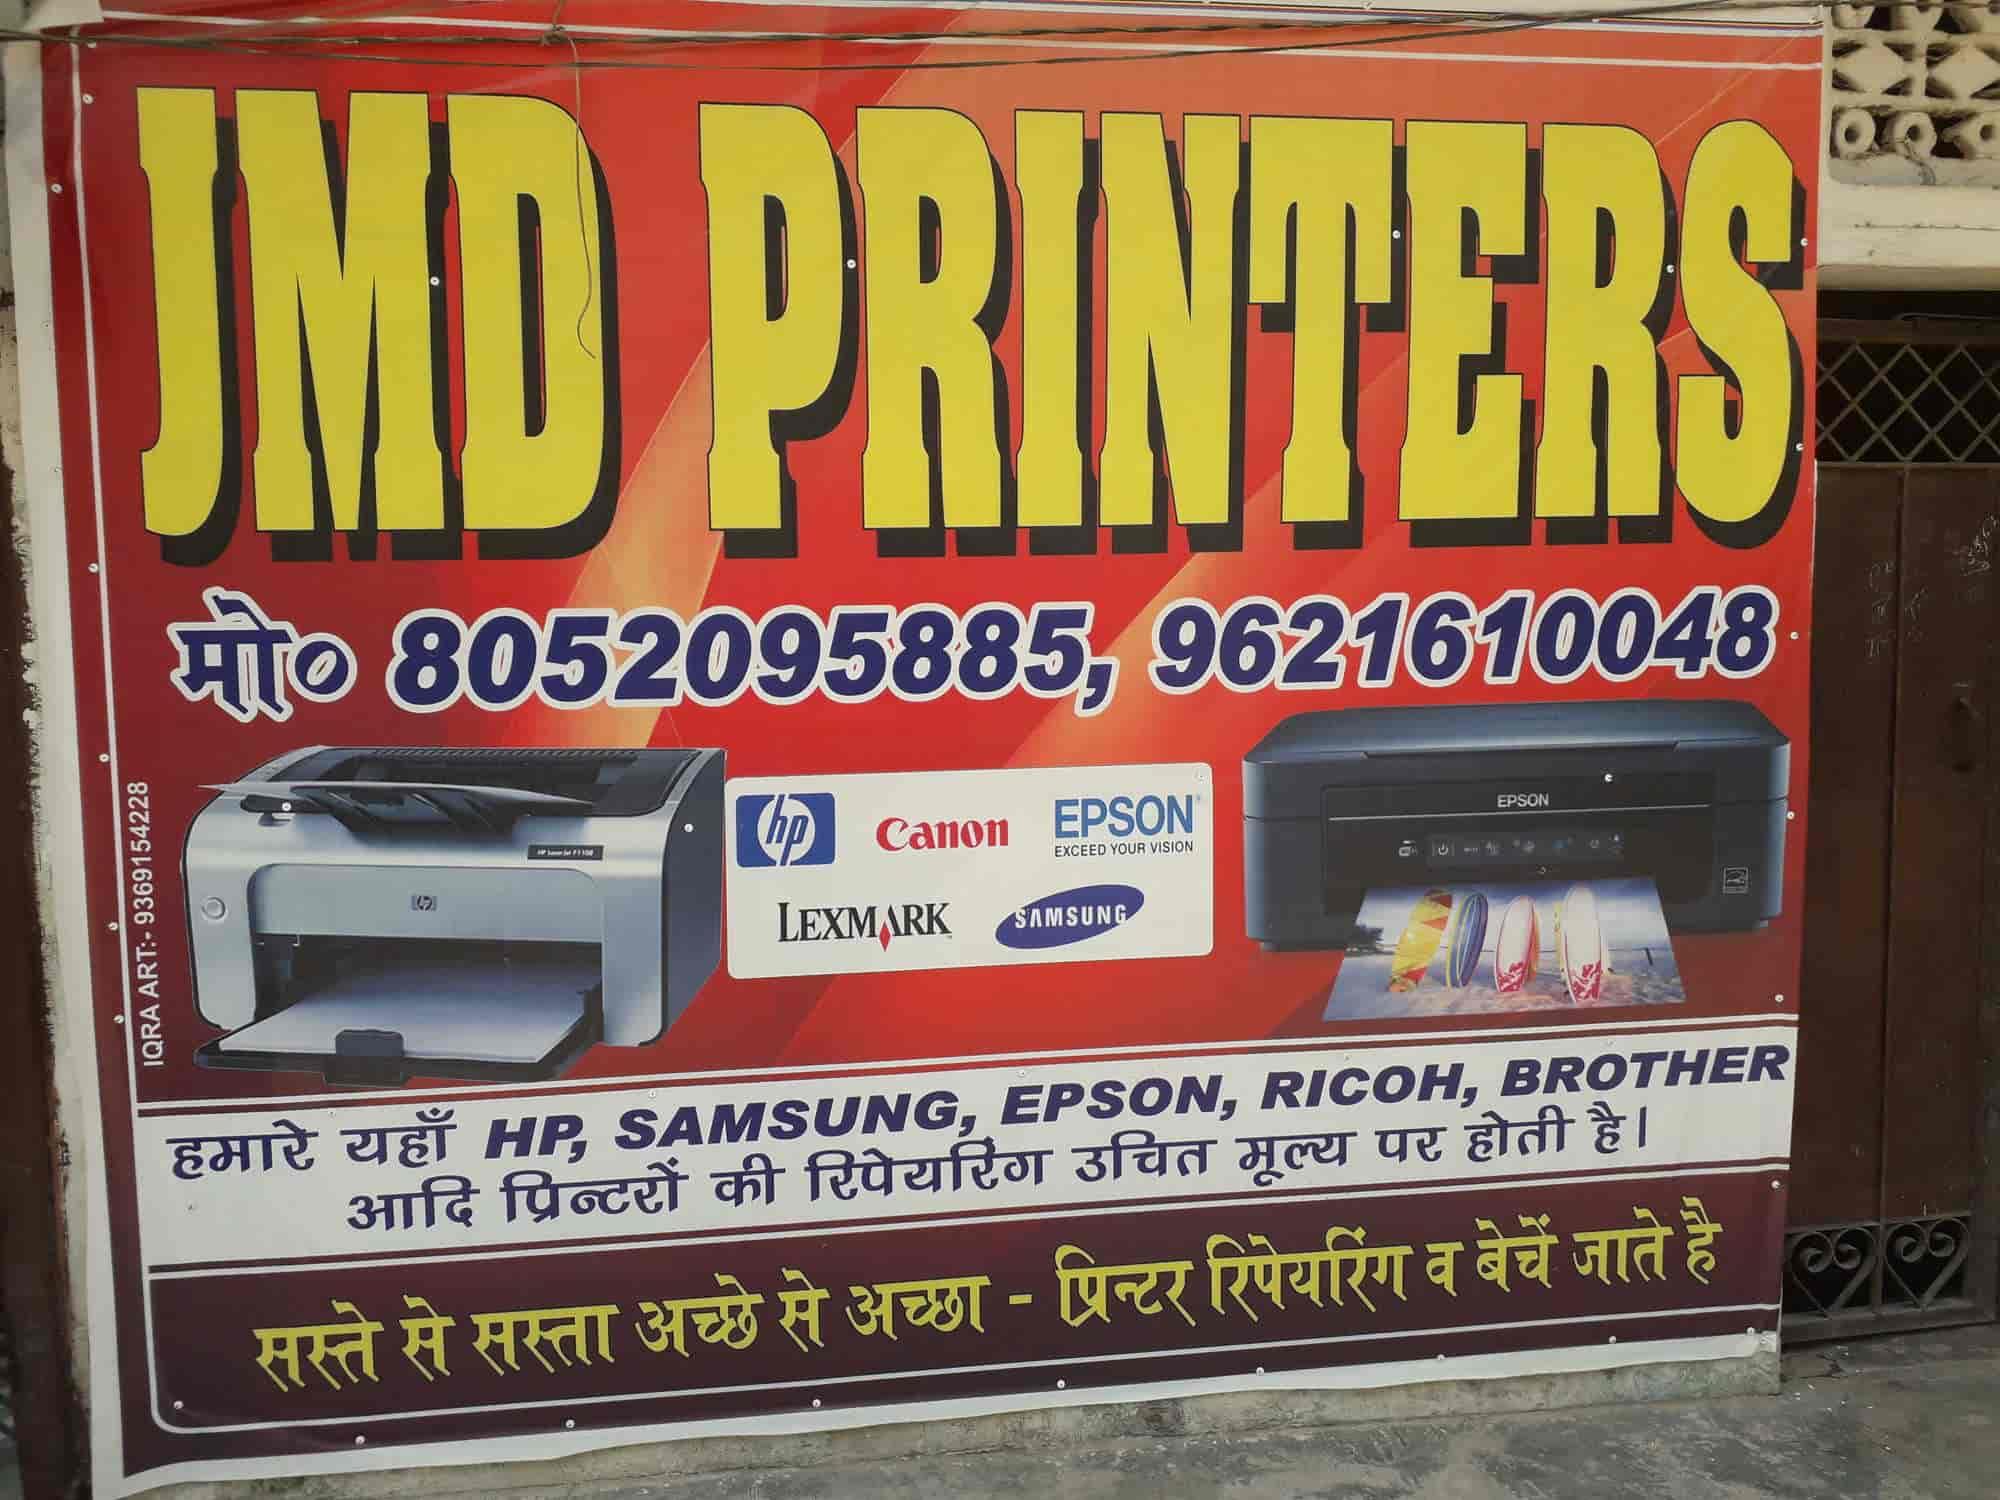 JMD Printers, Govind Nagar - Printing Press in Kanpur - Justdial